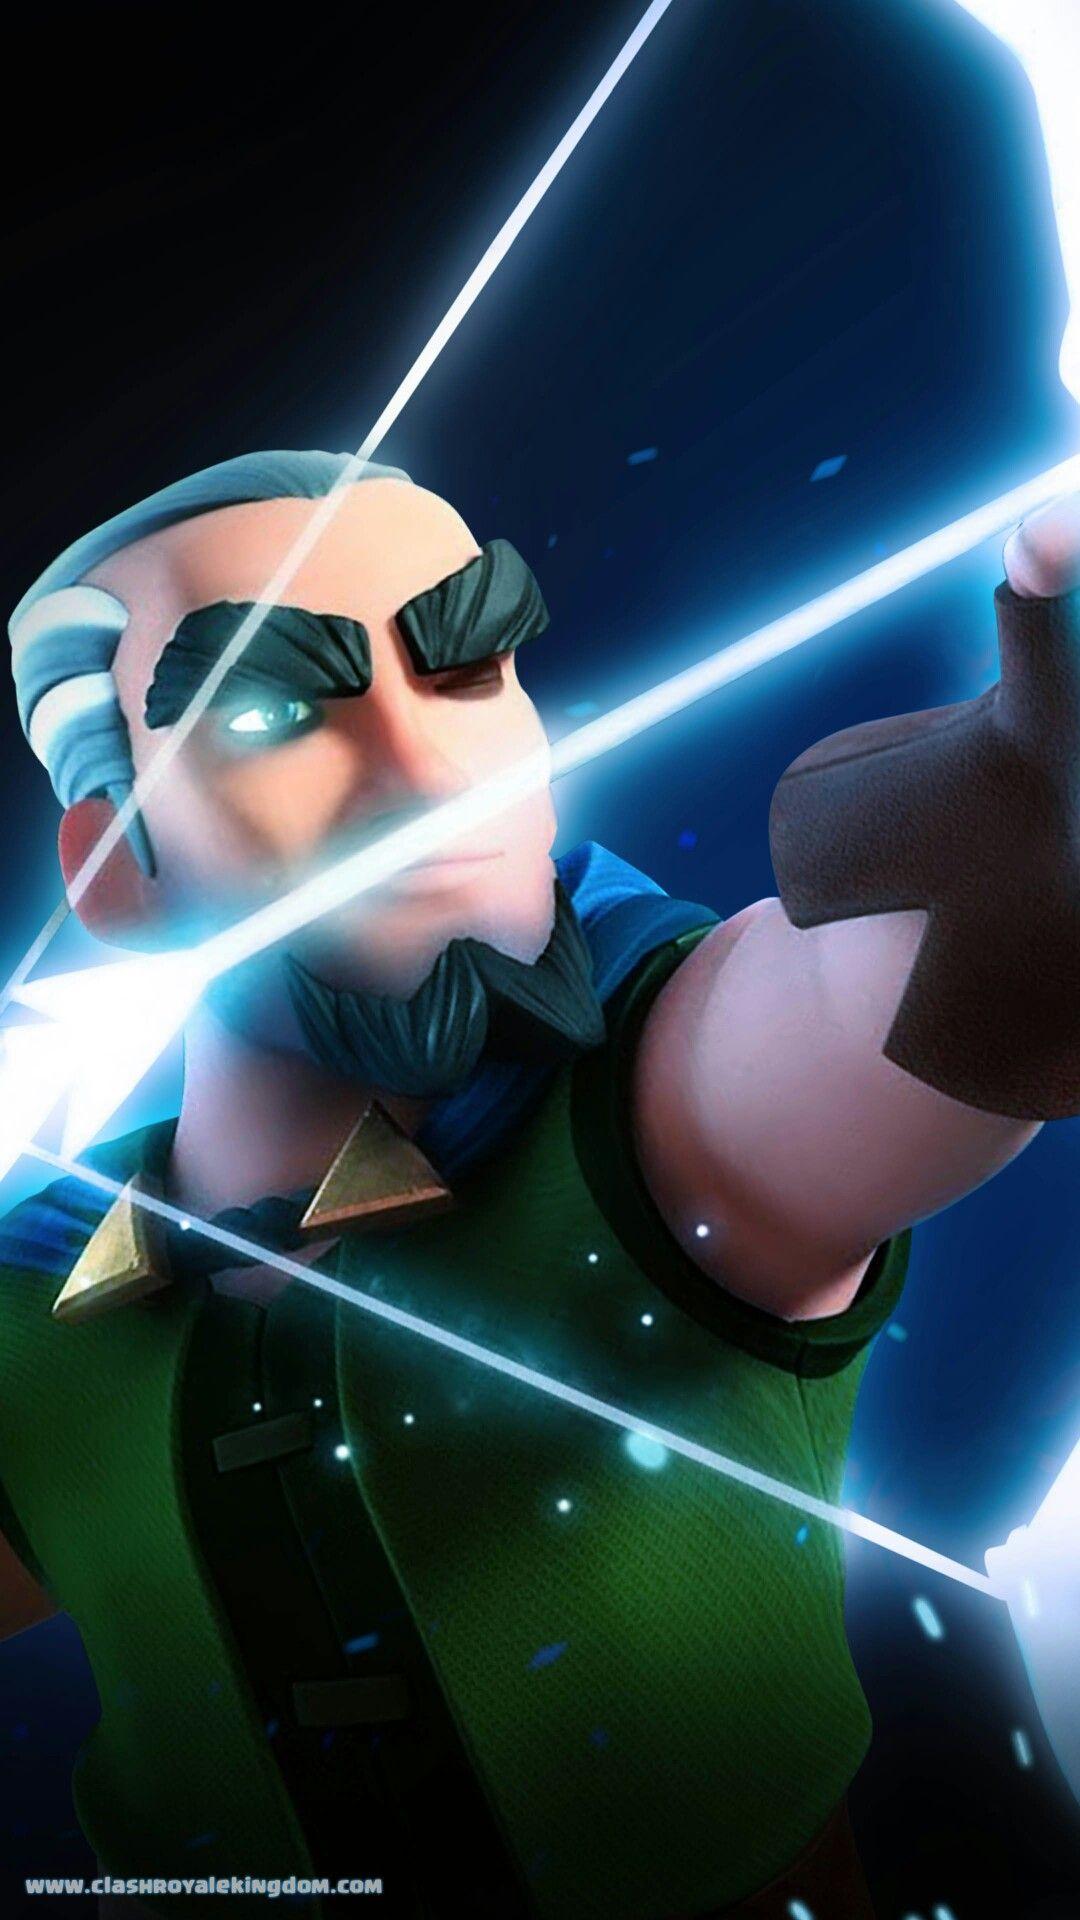 Magic Archer Aims Follow Before Save Clash Royale Wallpaper Clash Royale Clash Of Clans Game